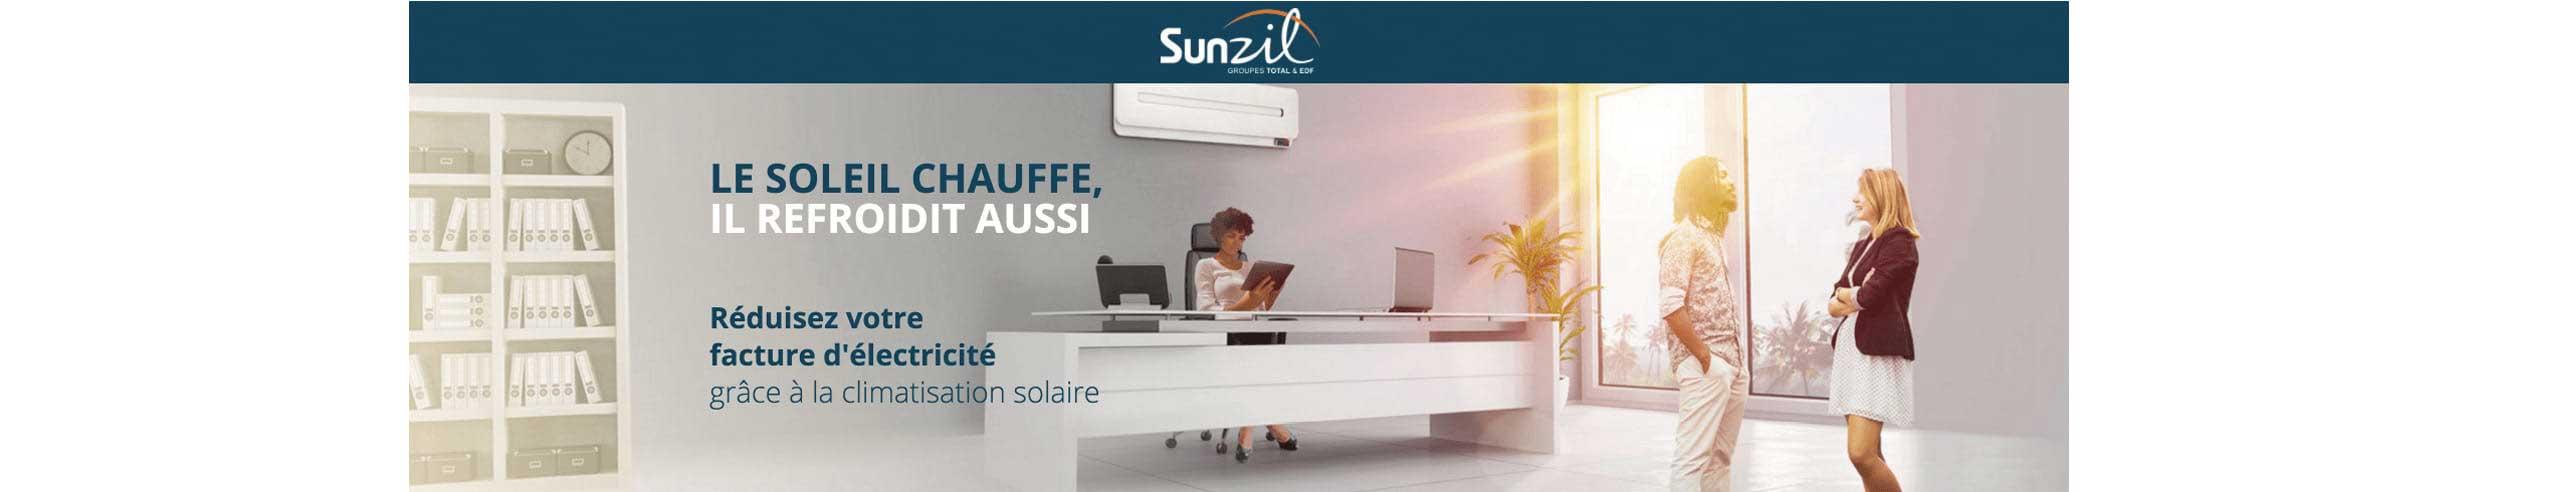 sunzil-banniere-1